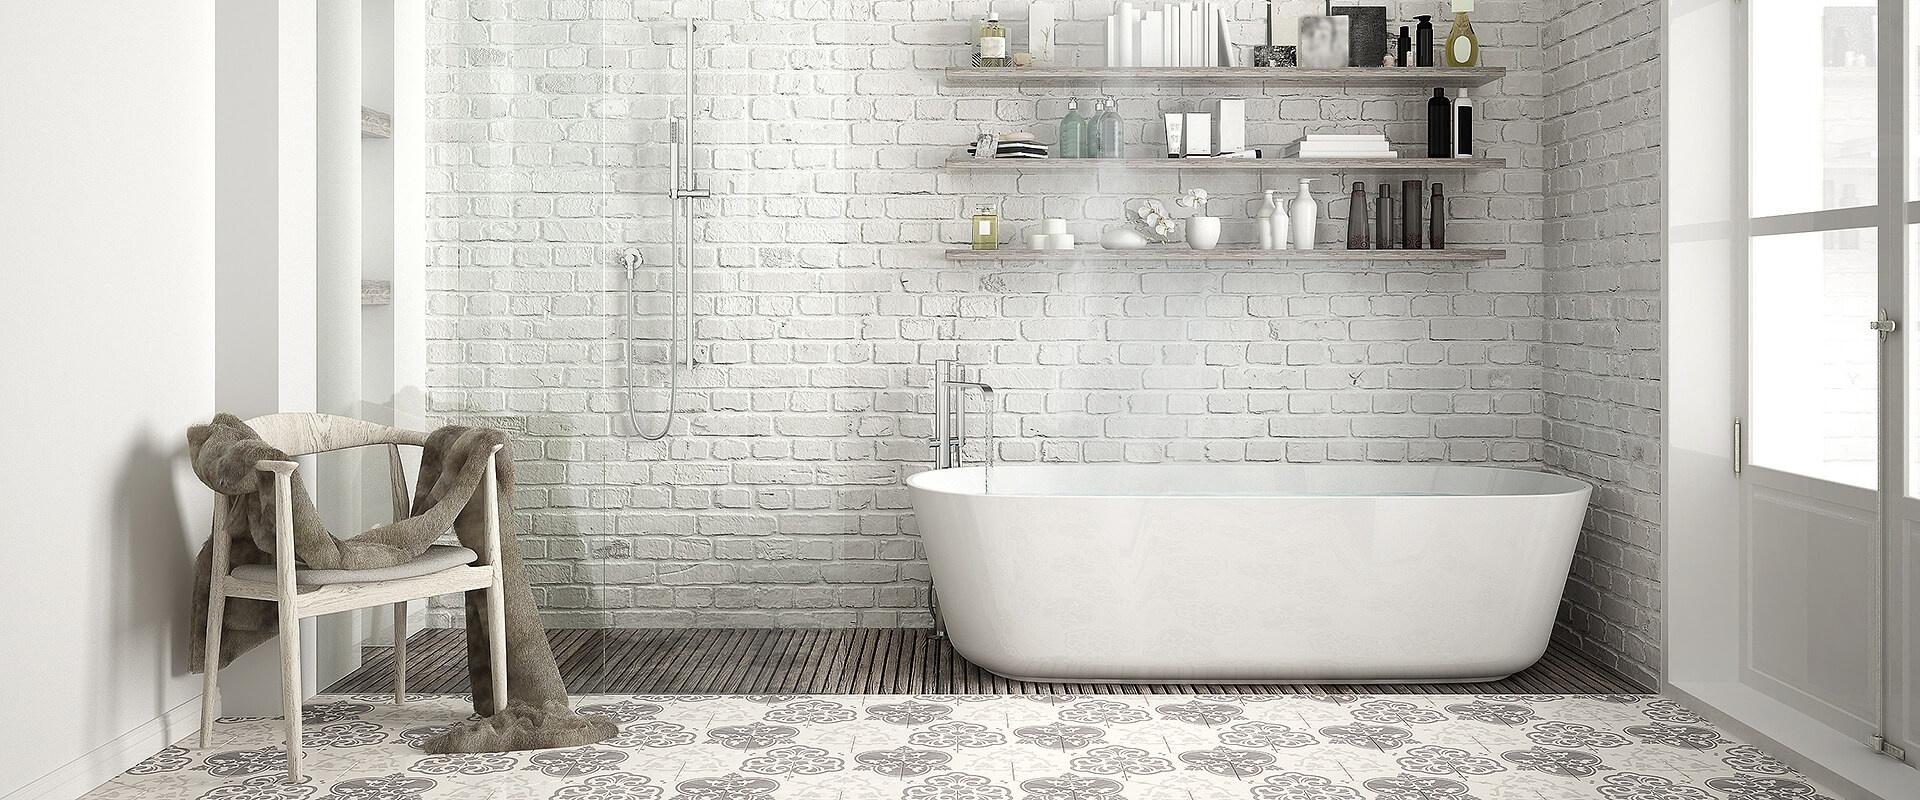 STL_Rustic Modern Bathroom